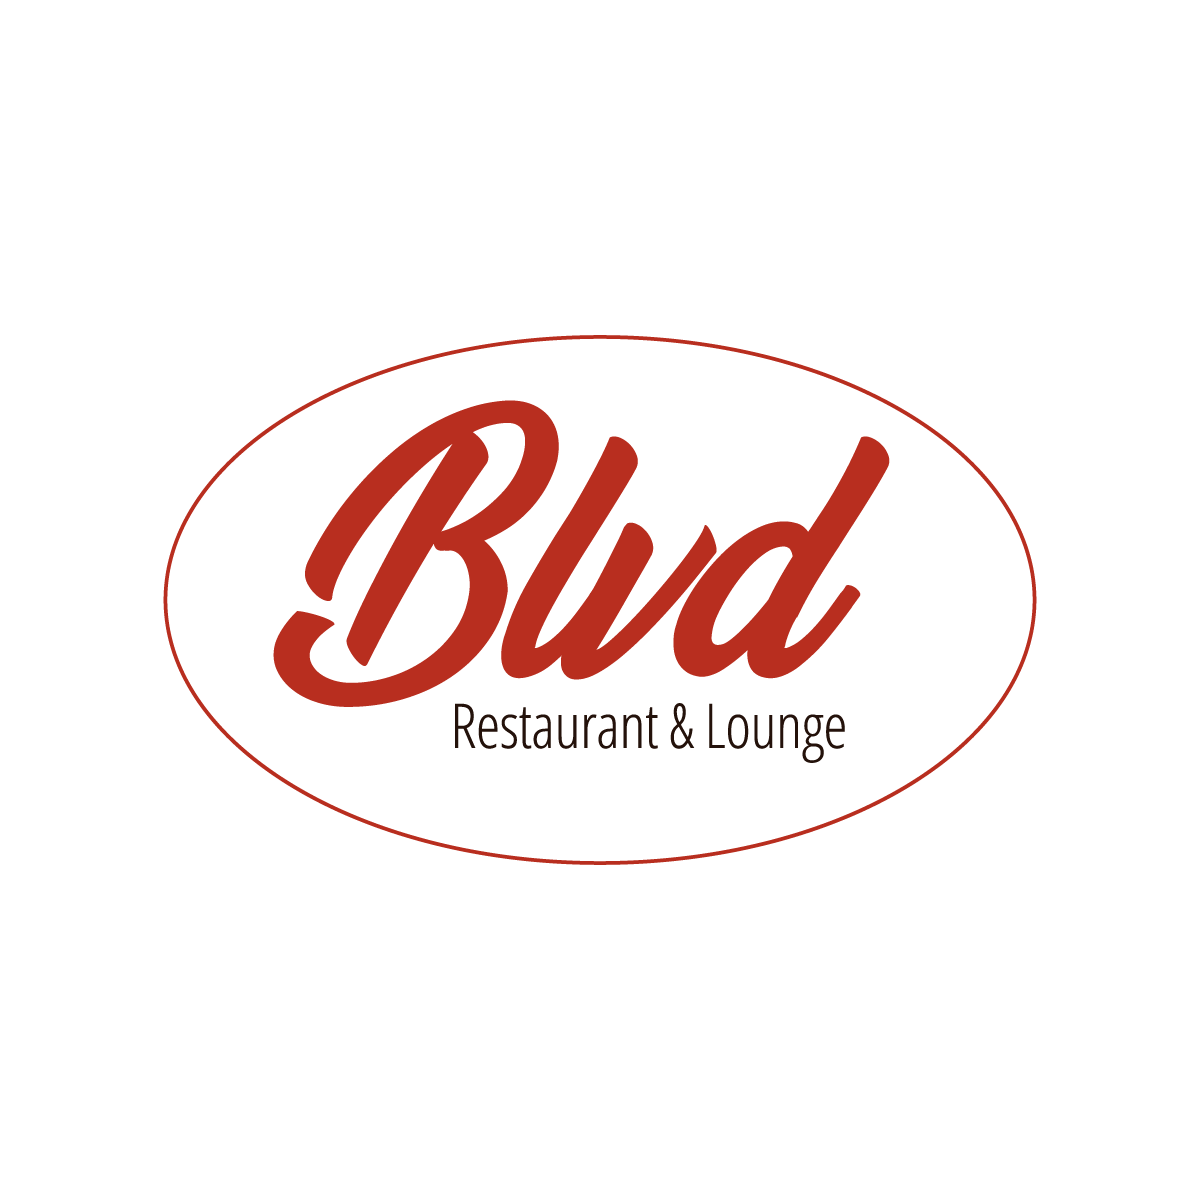 halal restaurant in Mississauga (logo concept and digital footprint)